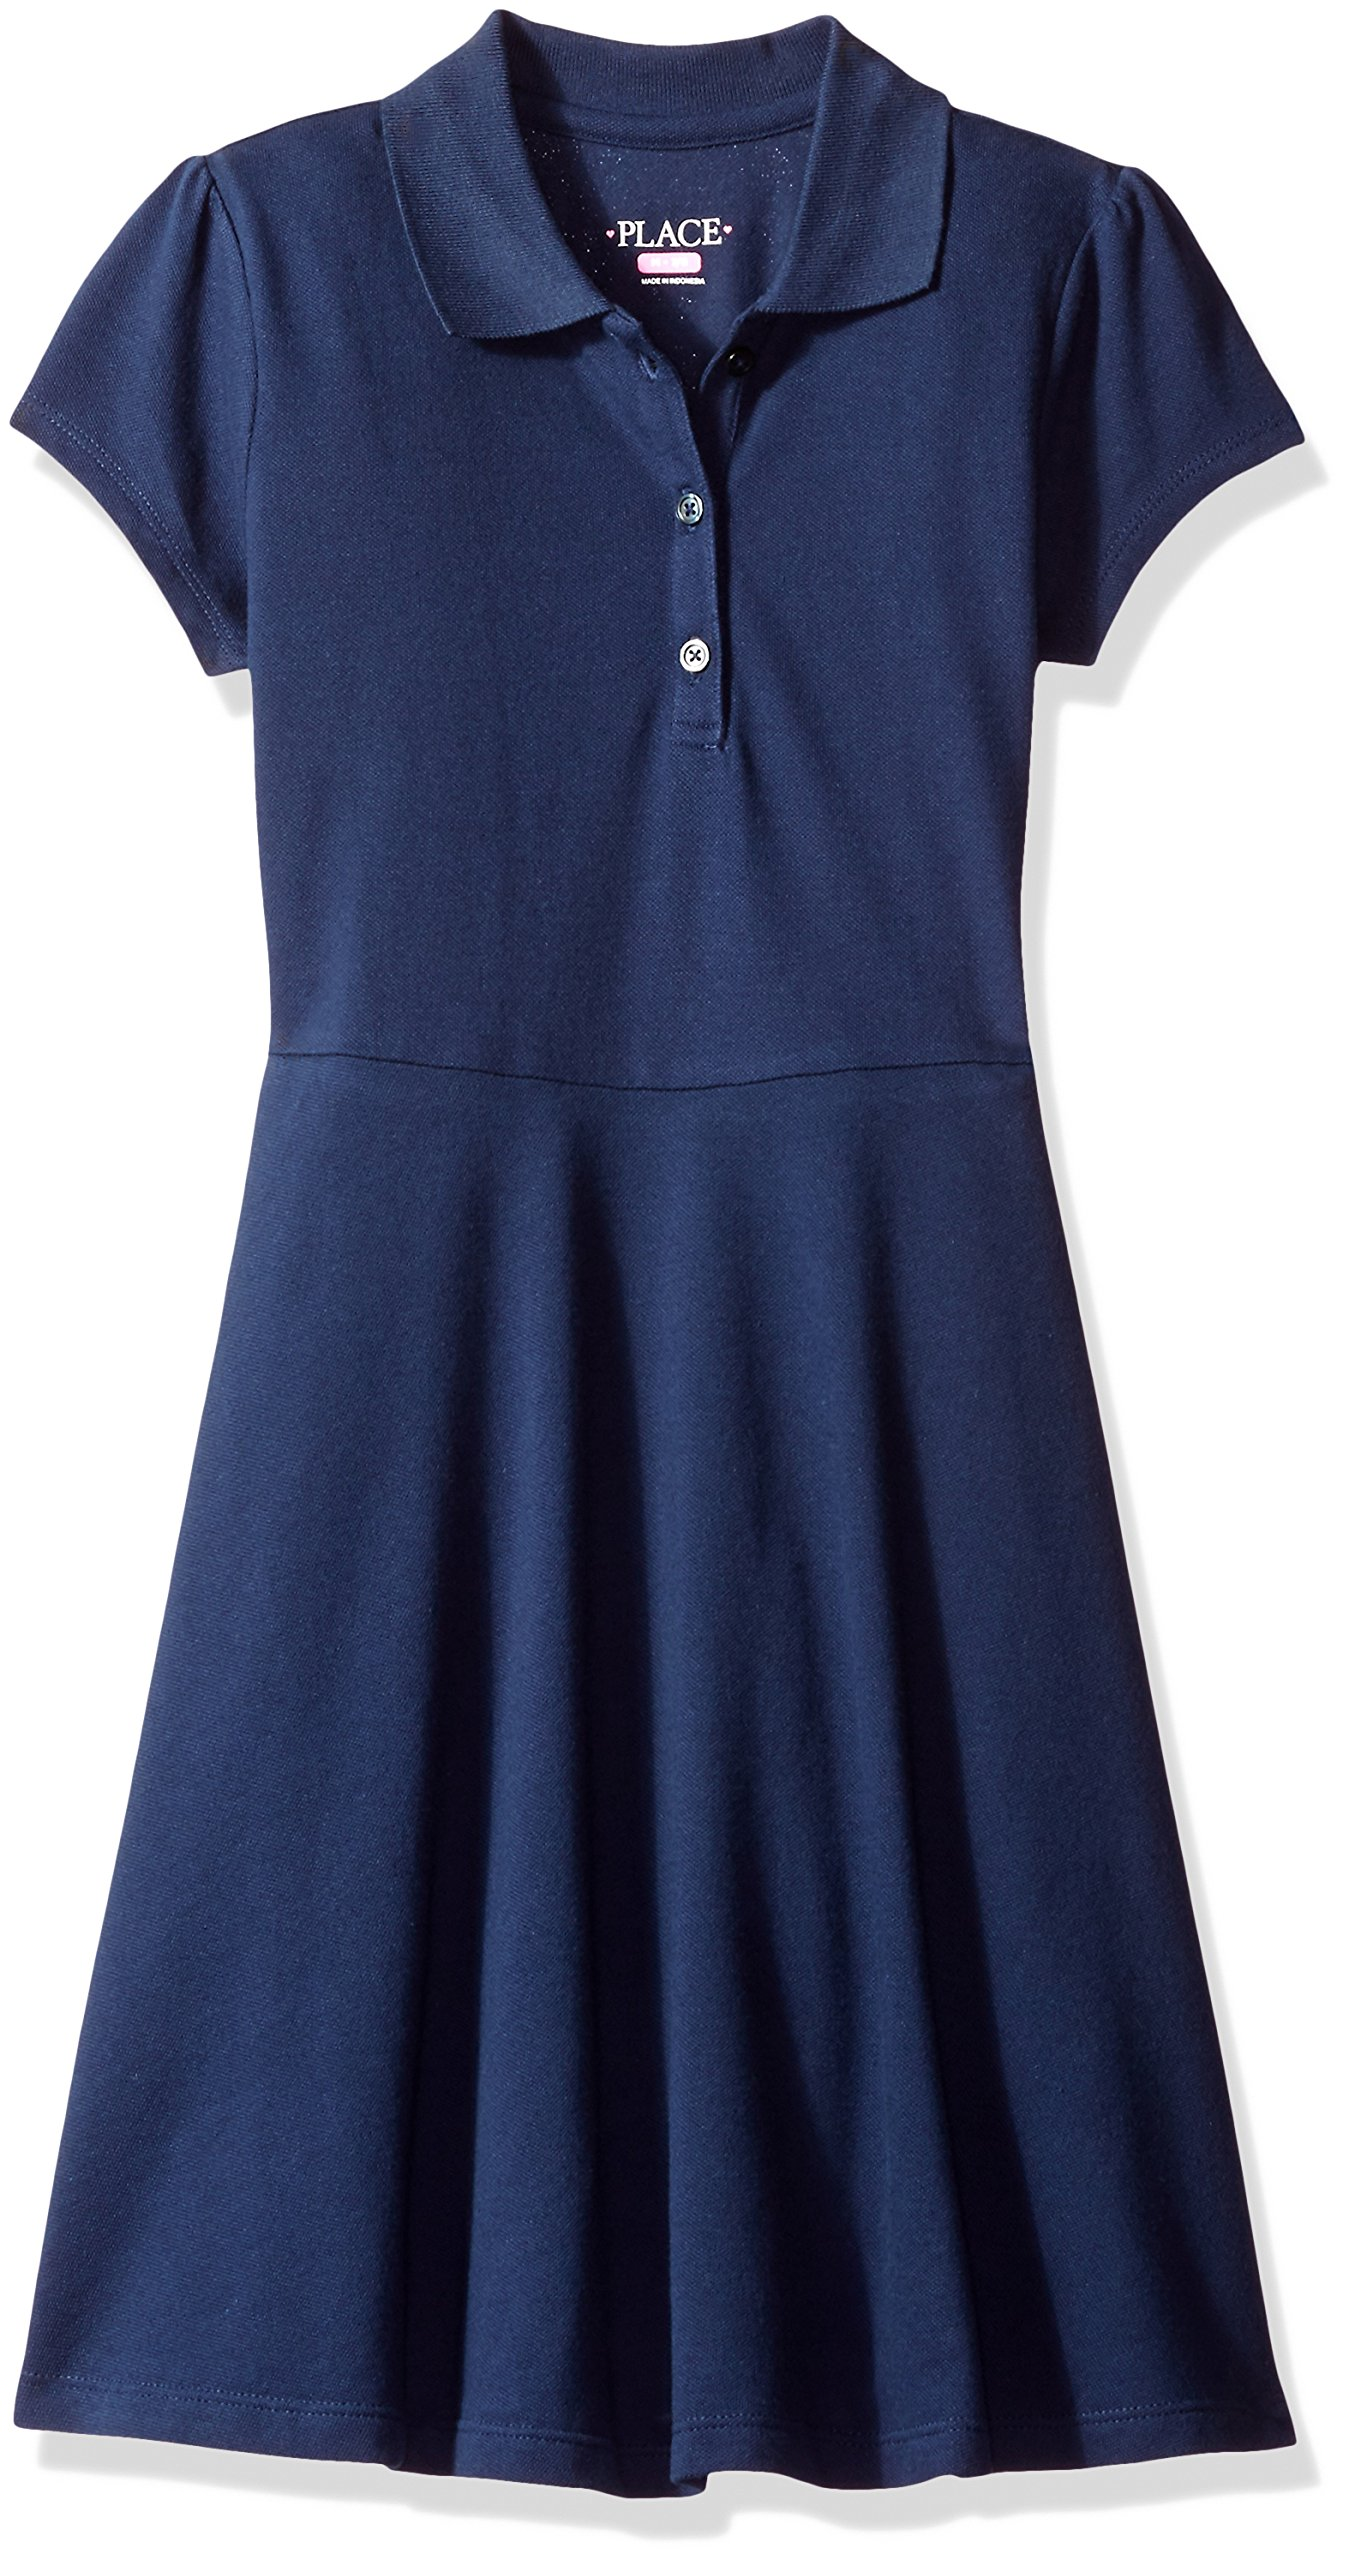 The Children's Place Big Girls' Uniform Short Sleeve Polo Dress, Tidal 44393, Medium/7/8